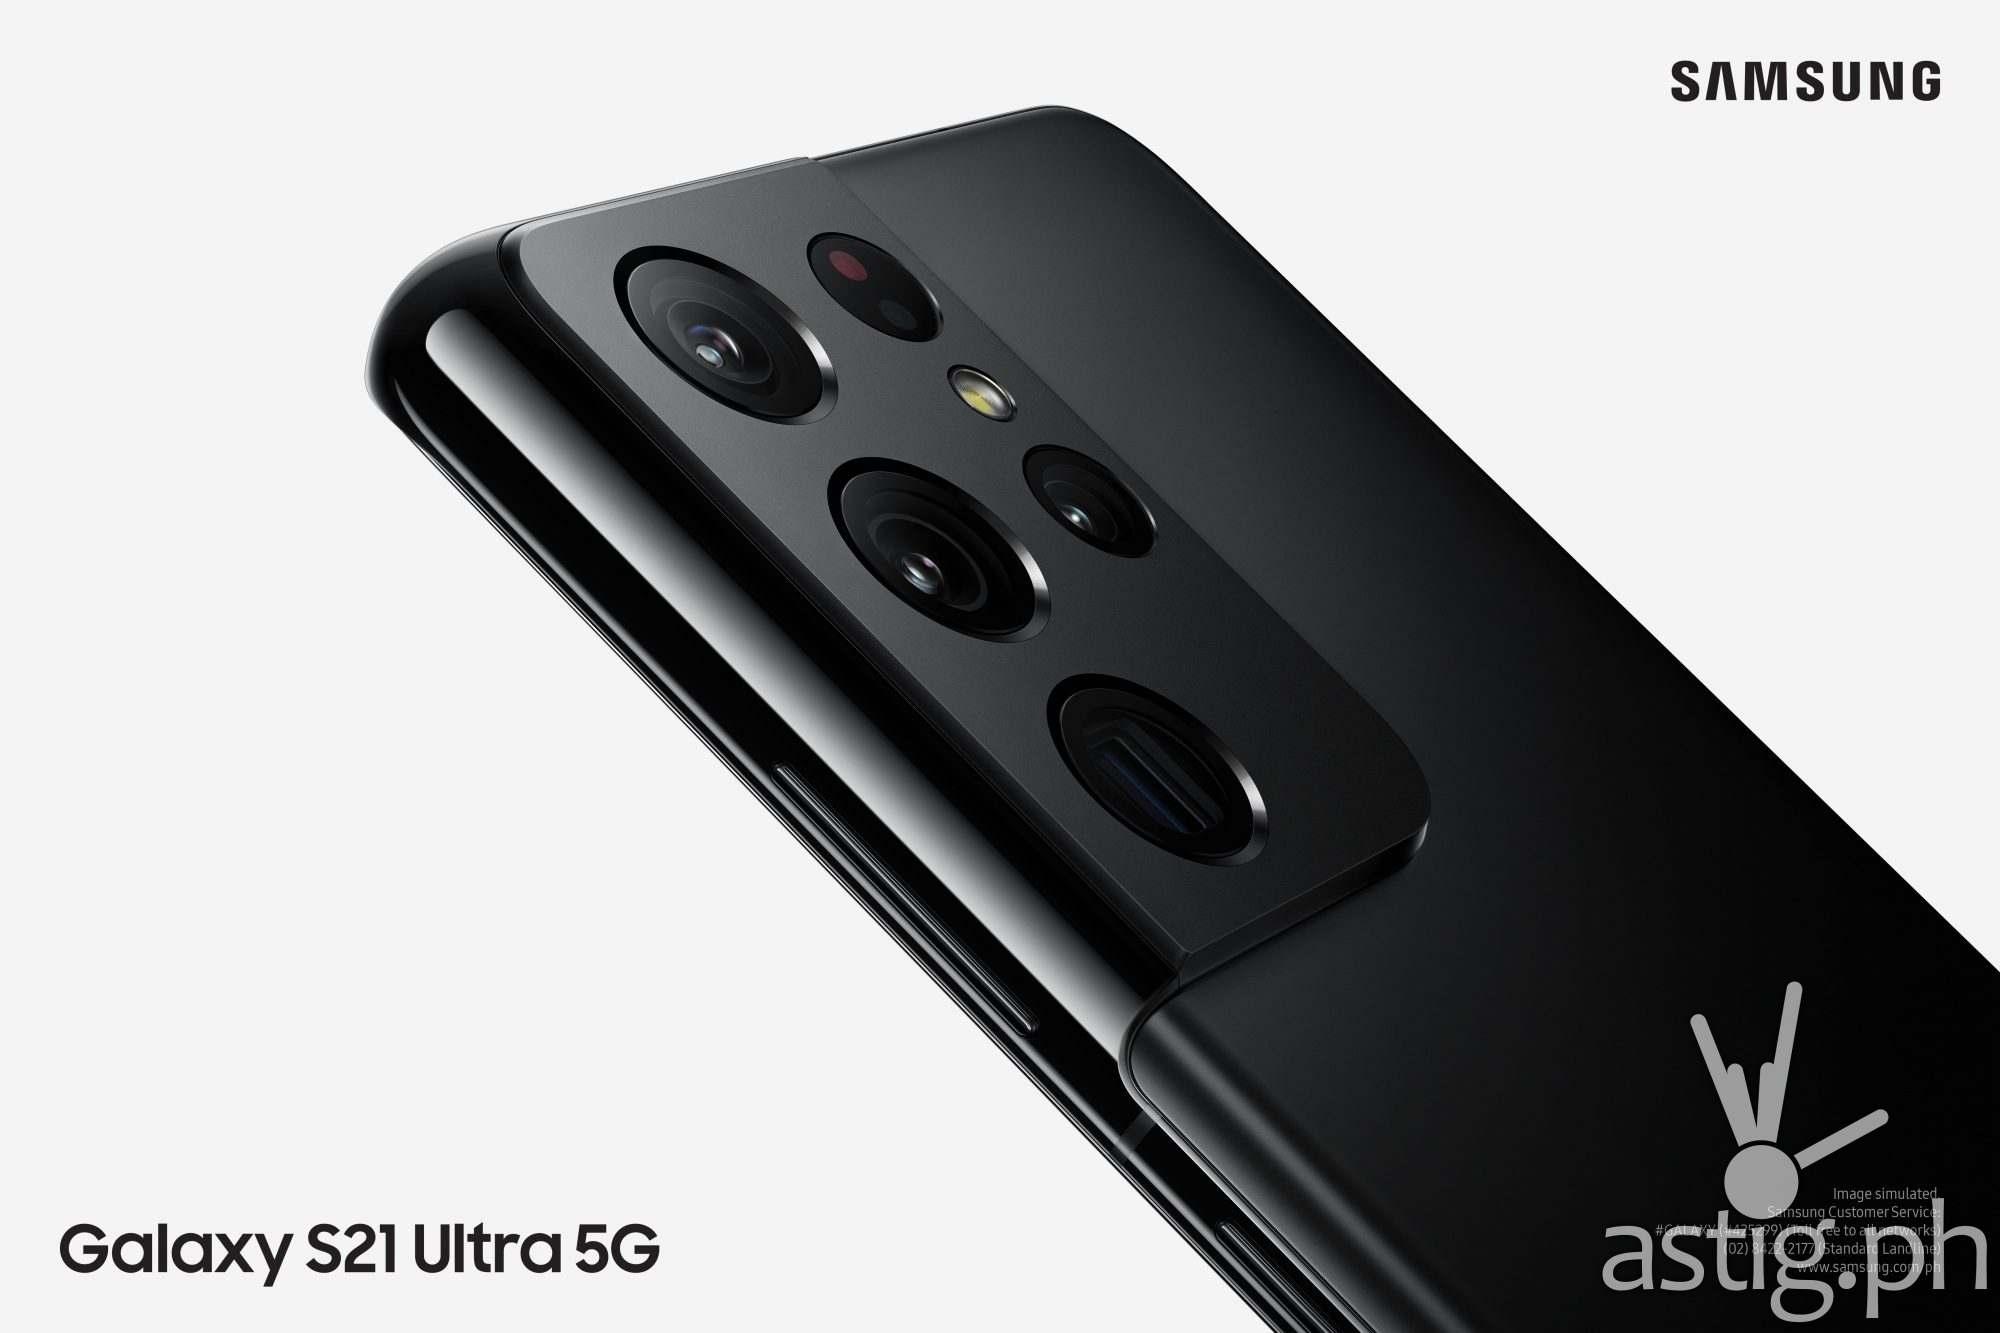 Galaxy S21 Ultra 5G - Galaxy S21 Series (Philippines)